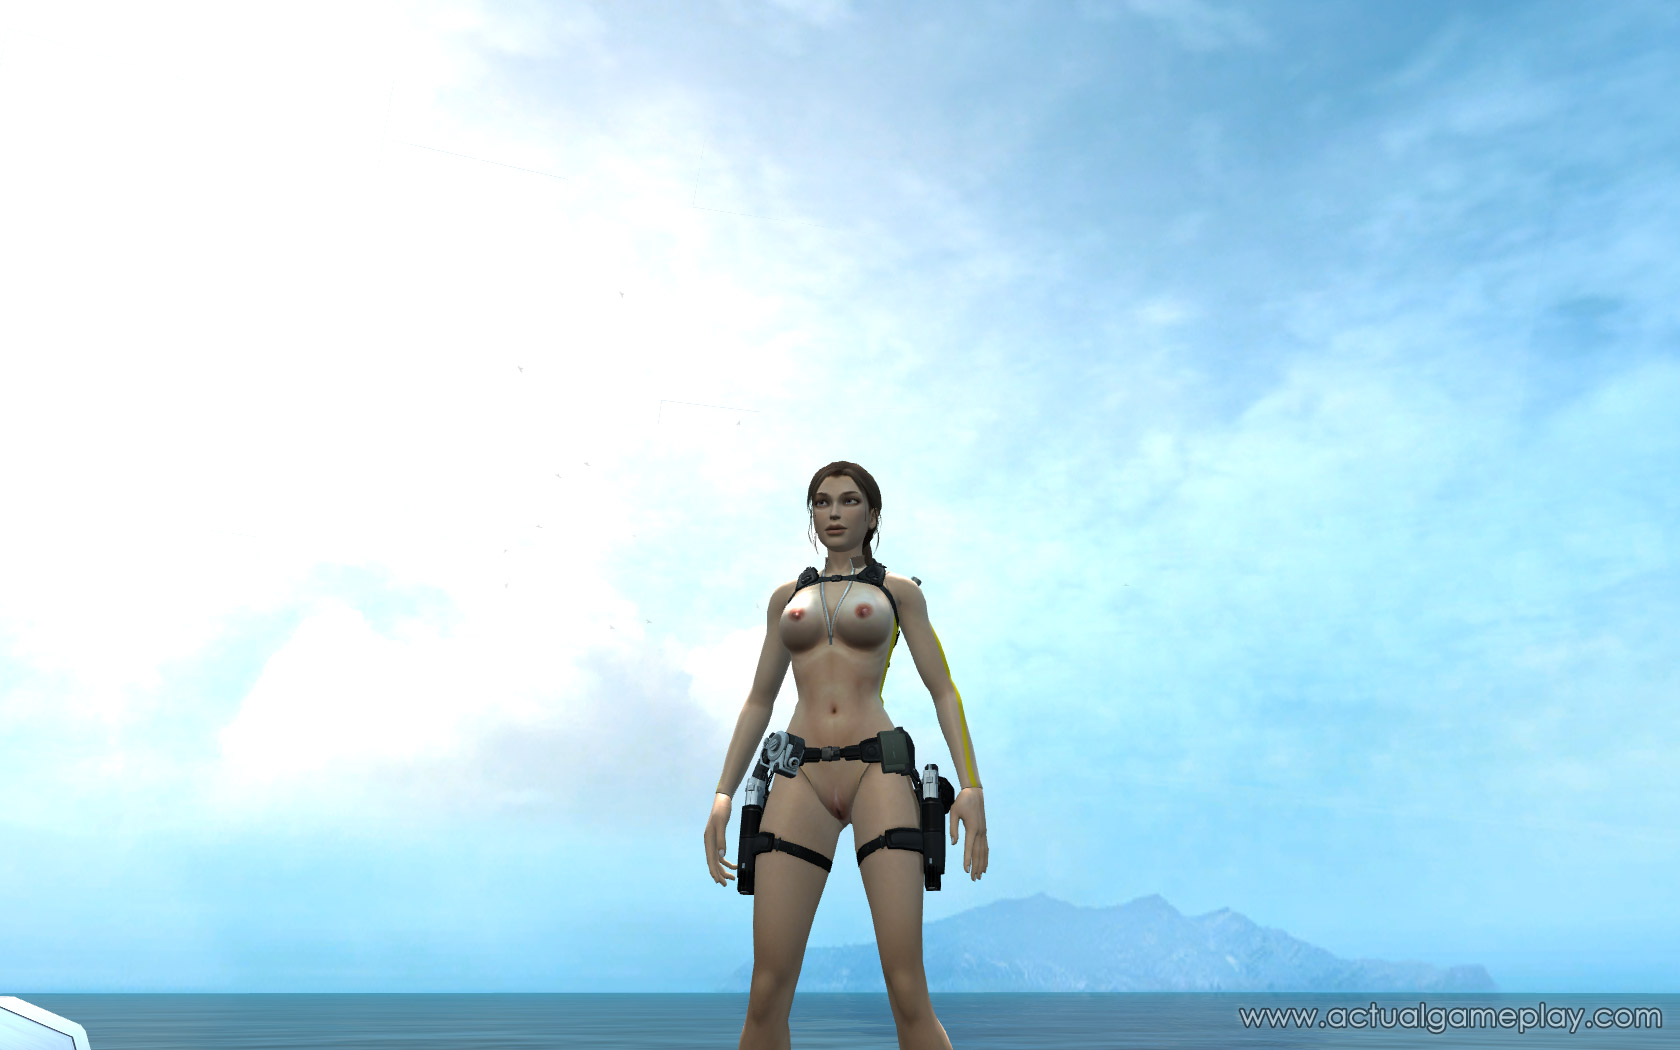 Tomb raider - underworld nude exploited image